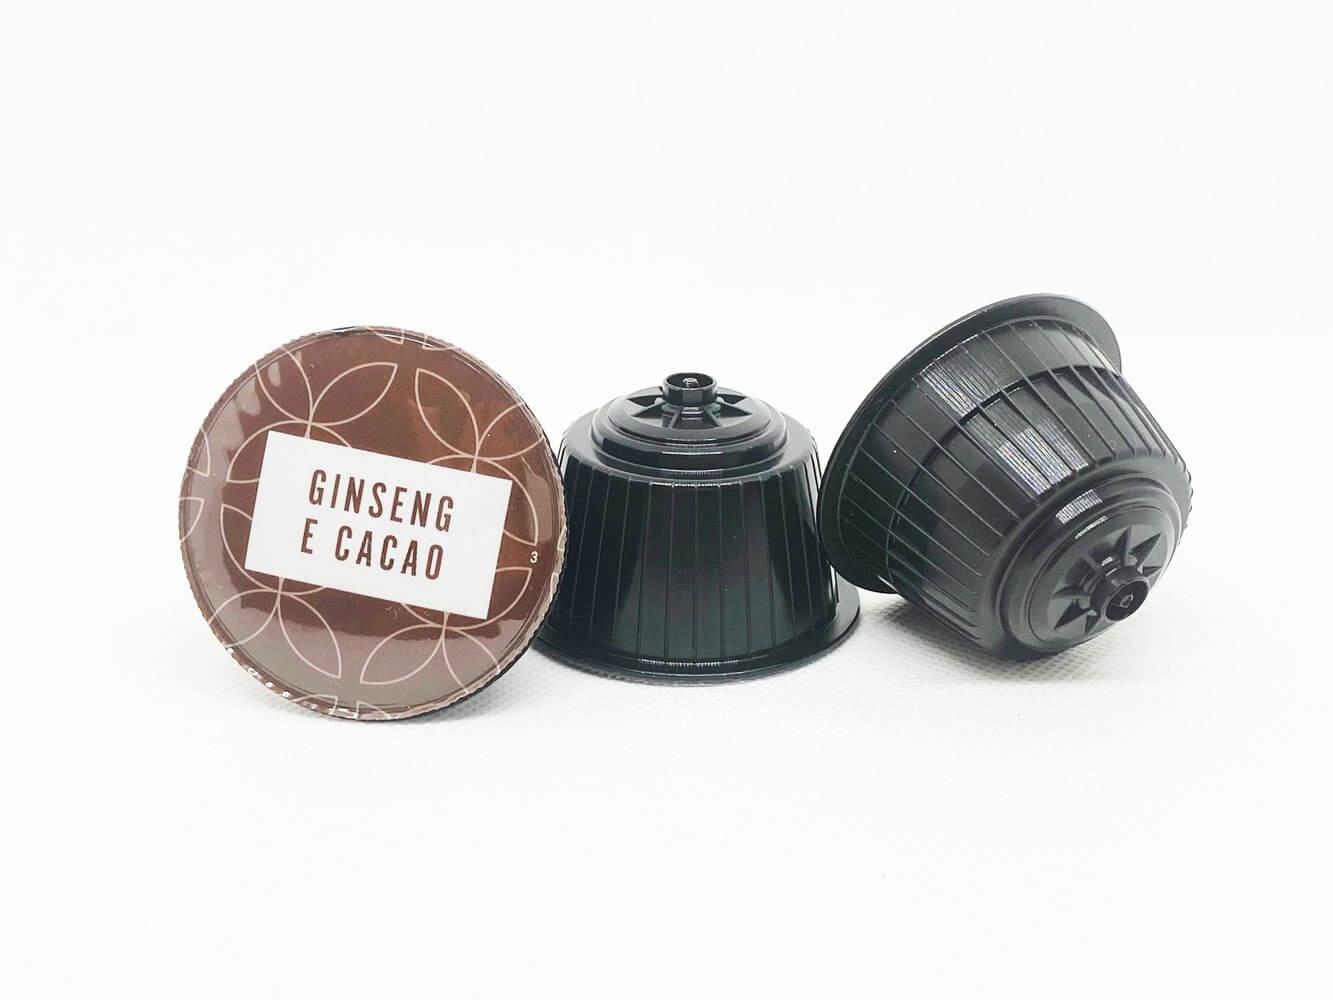 Capsule Dolce Gusto Caffè al Ginseng e Cacao